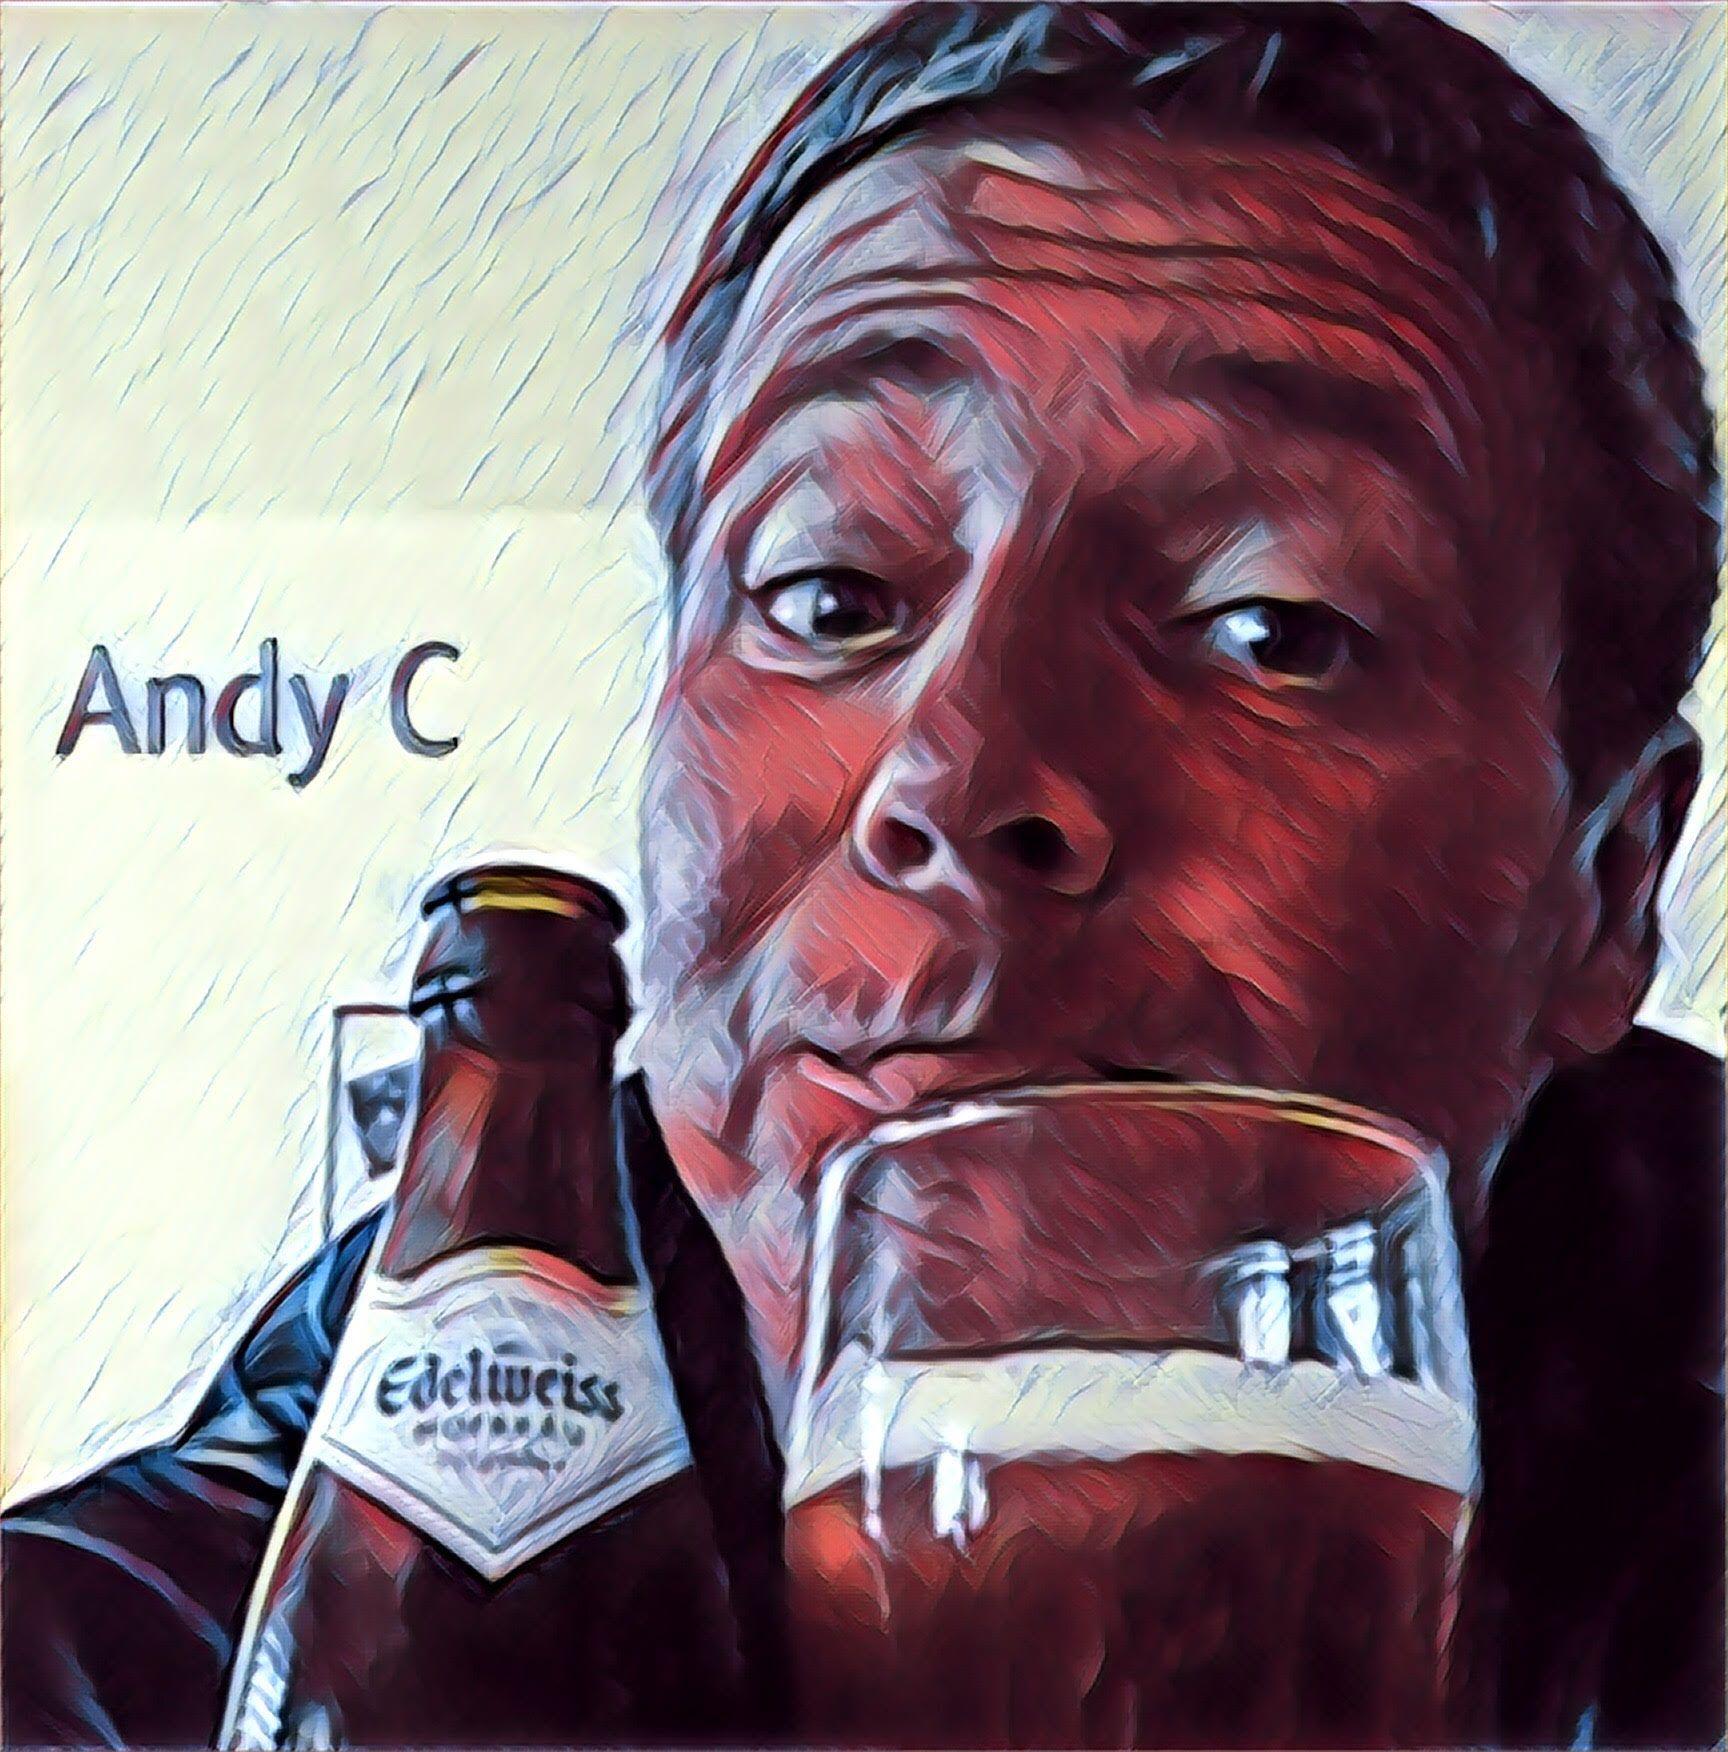 Andy Camenzind